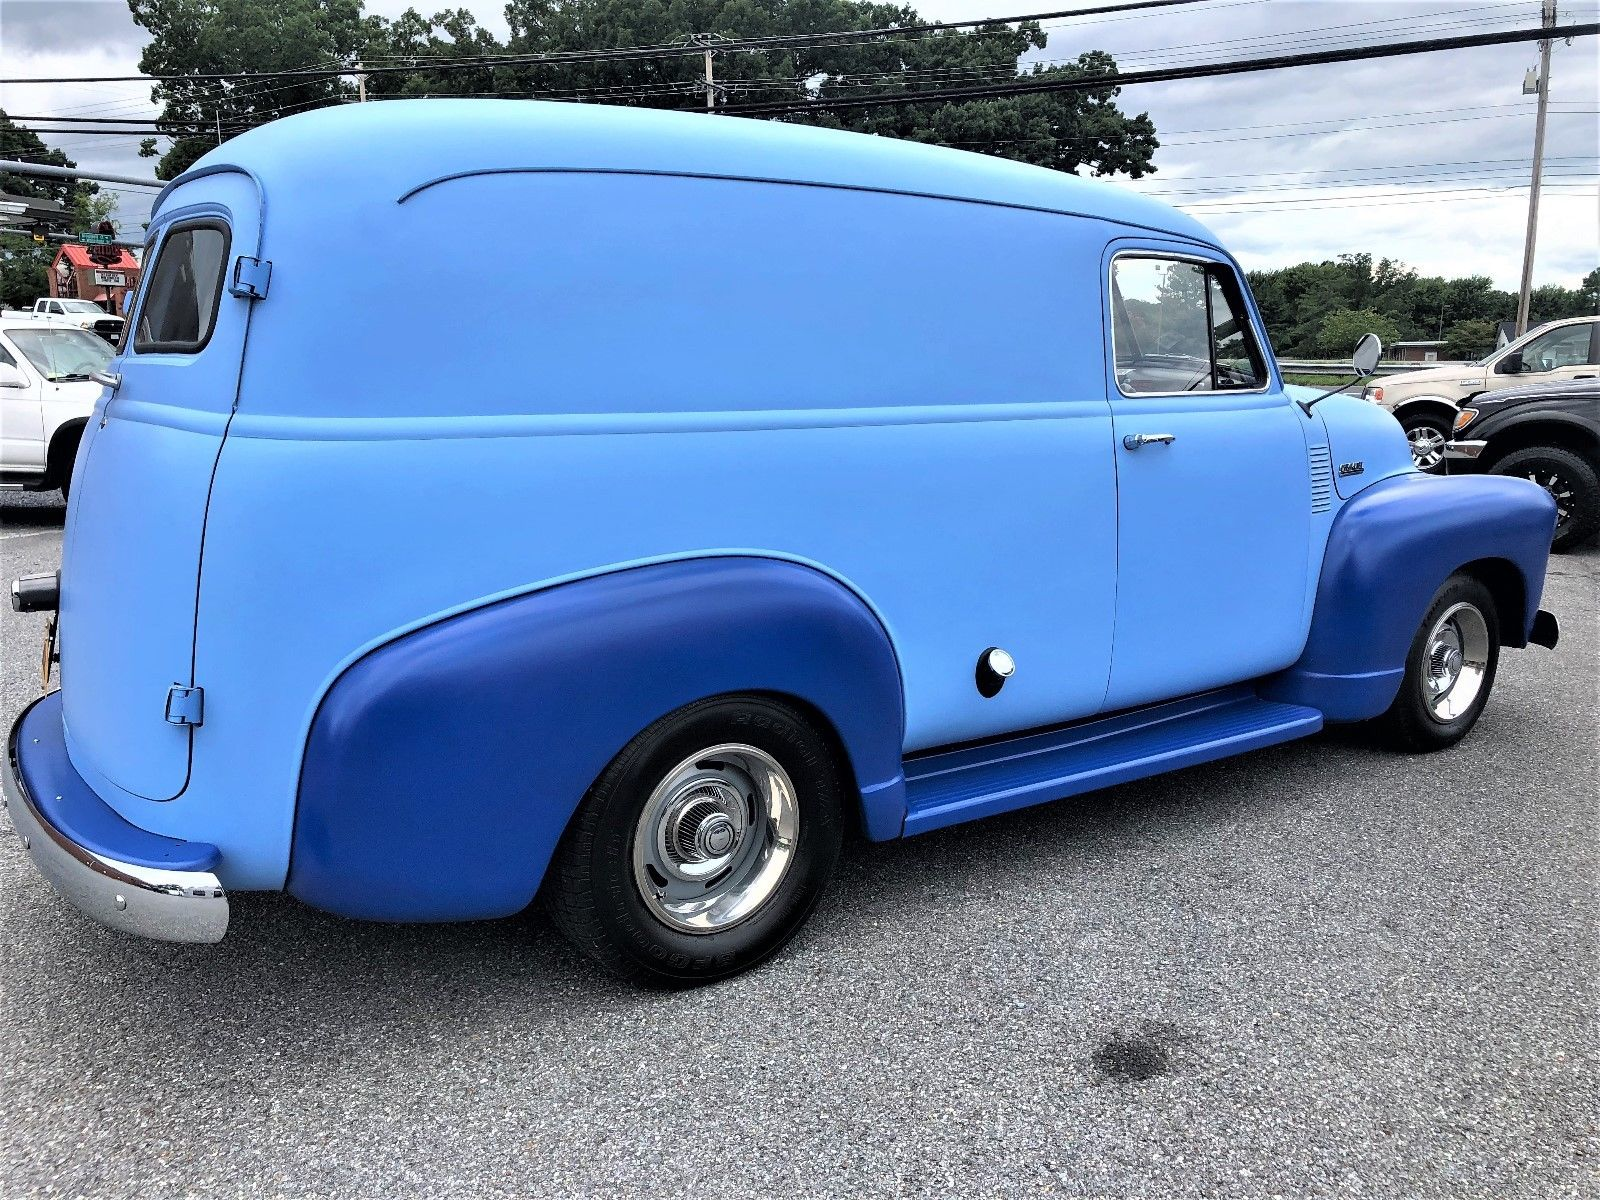 1952 Chevrolet C10 Panel 1952 Chevy Panel Truck 2019 ...